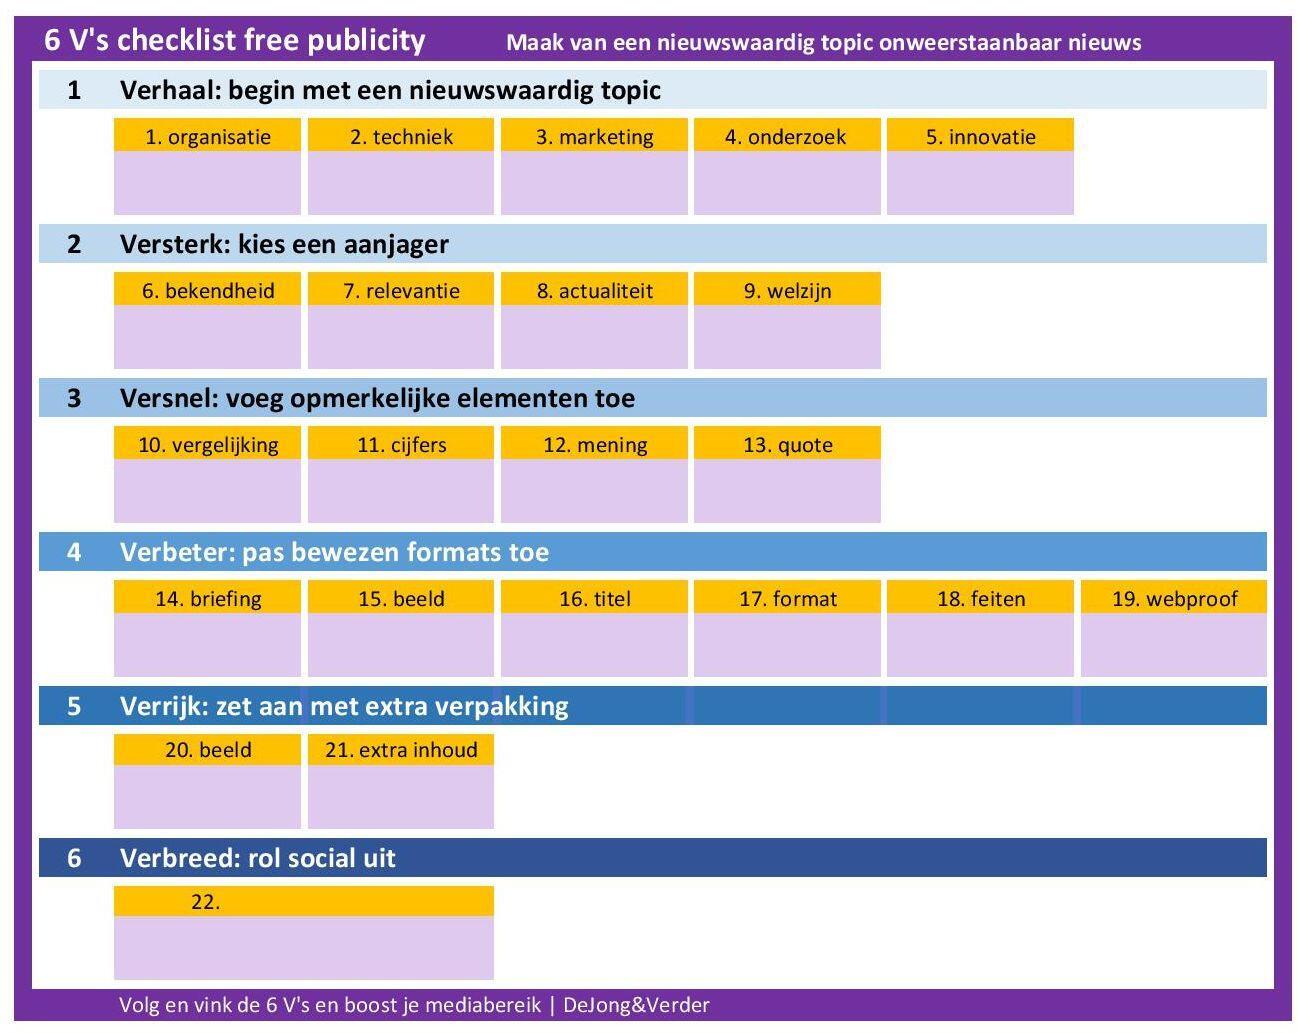 6V checklist free publicity